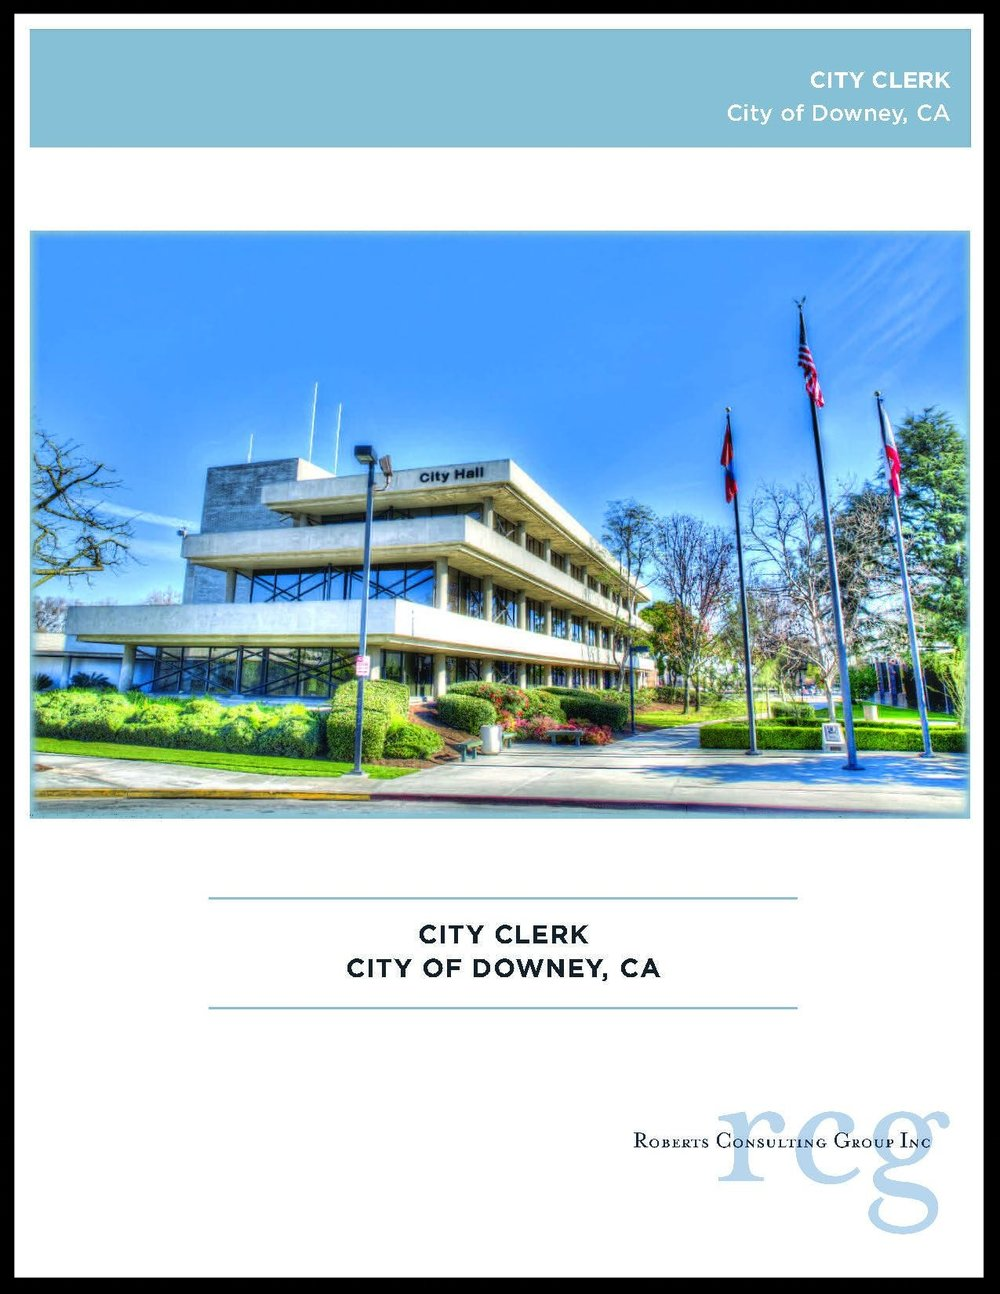 rcg_Downey_CityClerk_brochure_cover.jpg